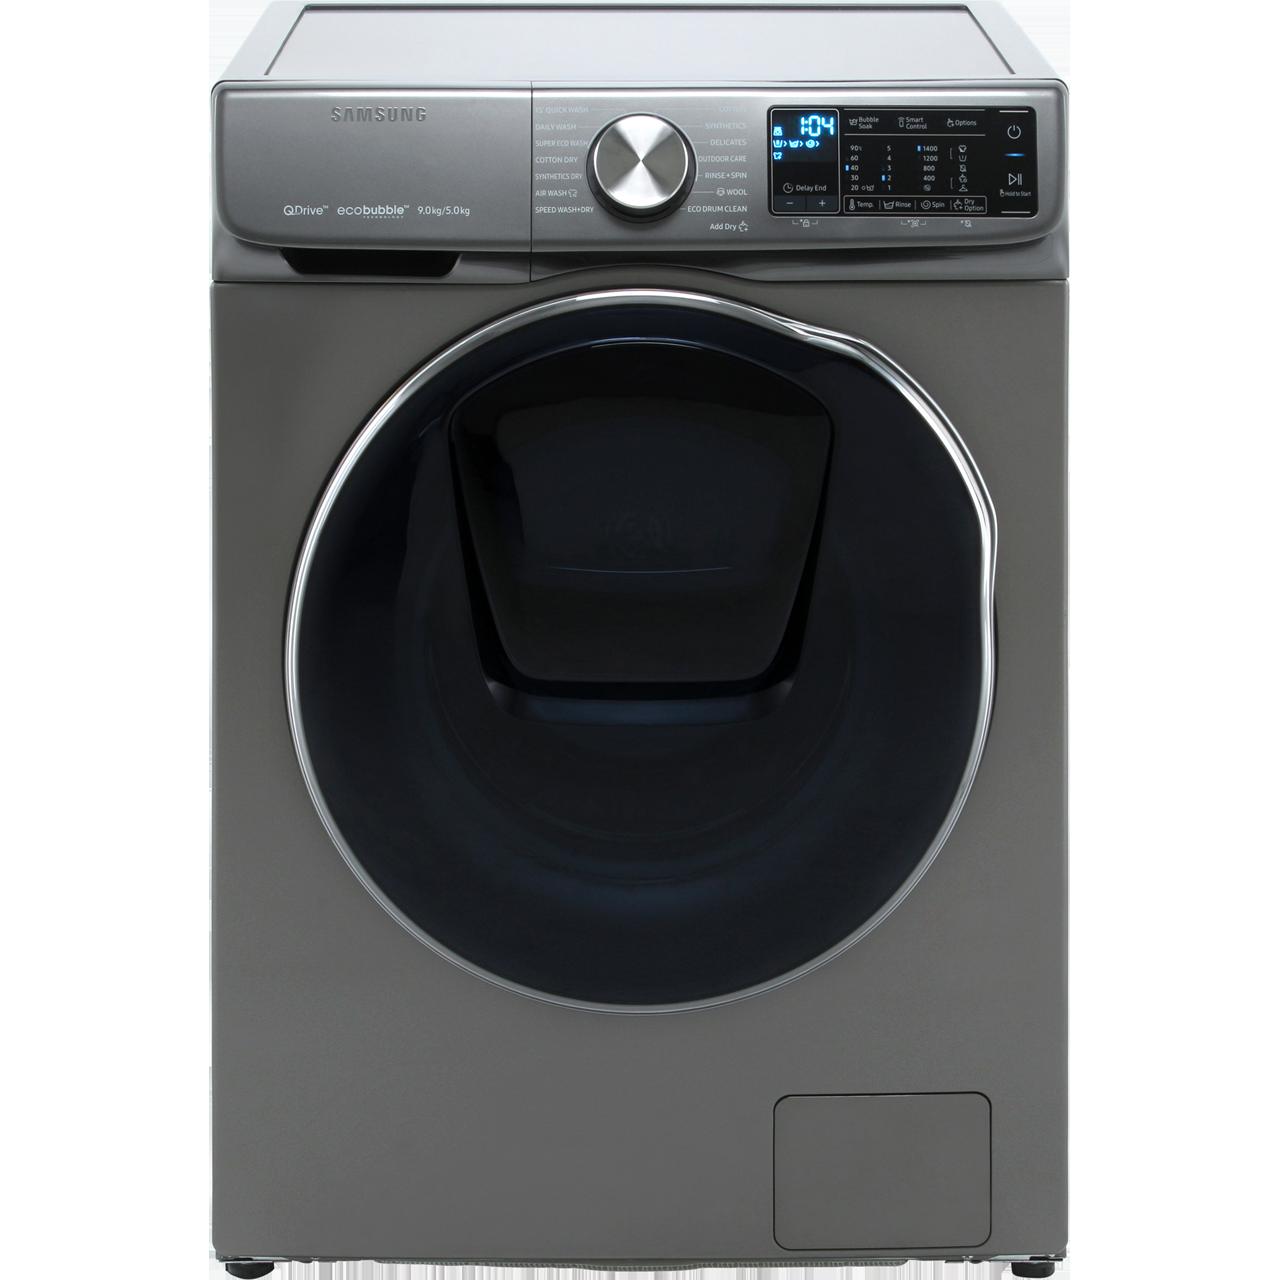 samsung quickdrive wd90n645oox washer dryer graphite. Black Bedroom Furniture Sets. Home Design Ideas